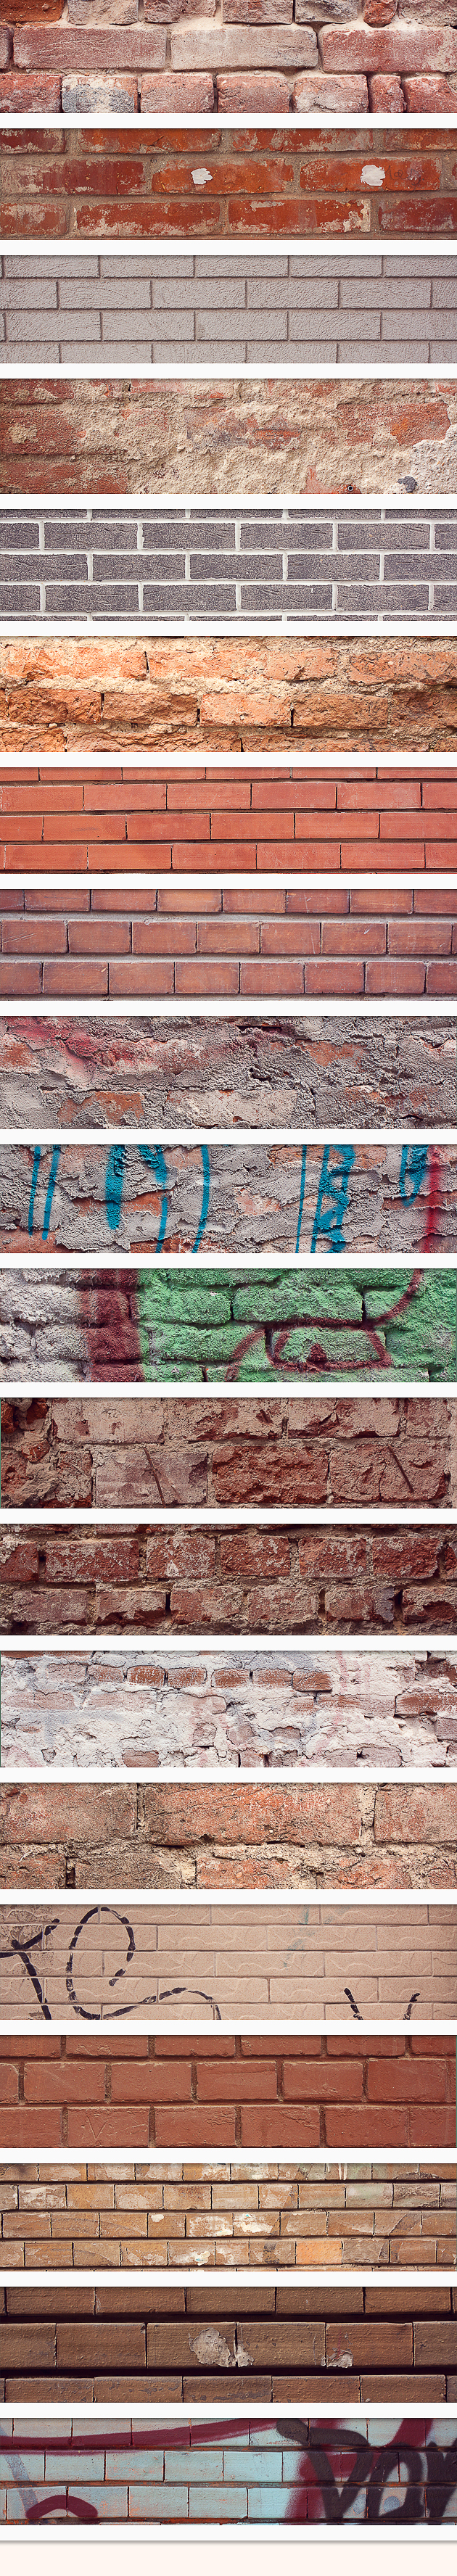 Brick Wall Textures designtnt brick wall textures set large